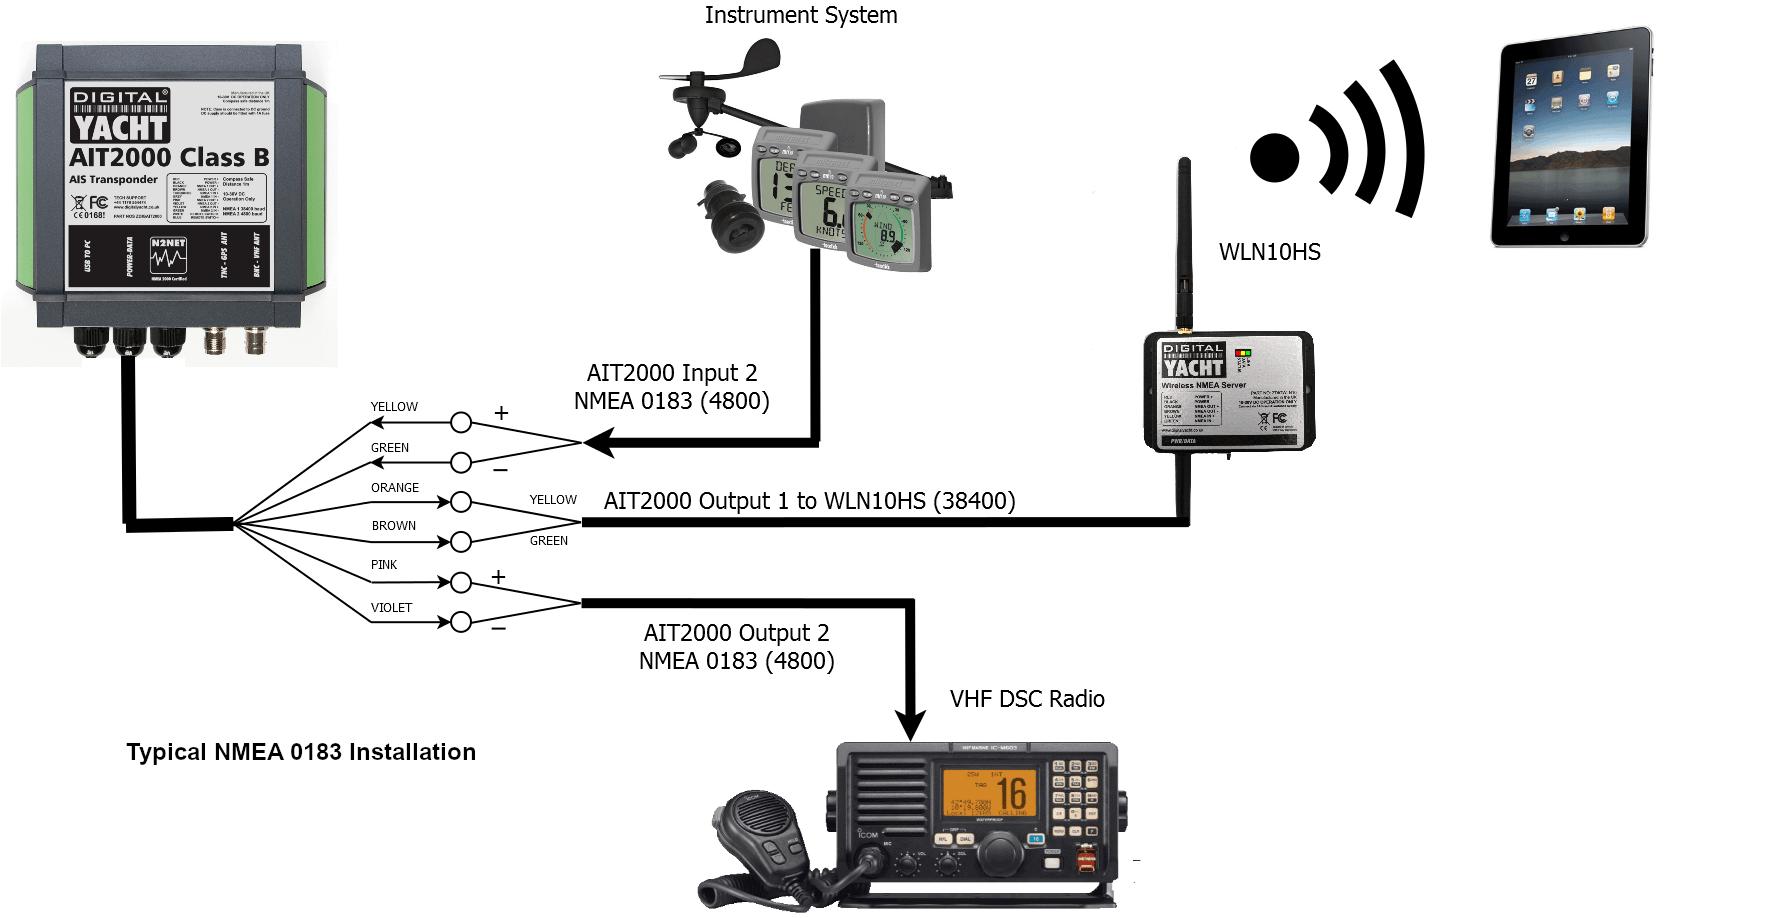 NMEA 0183 diagram